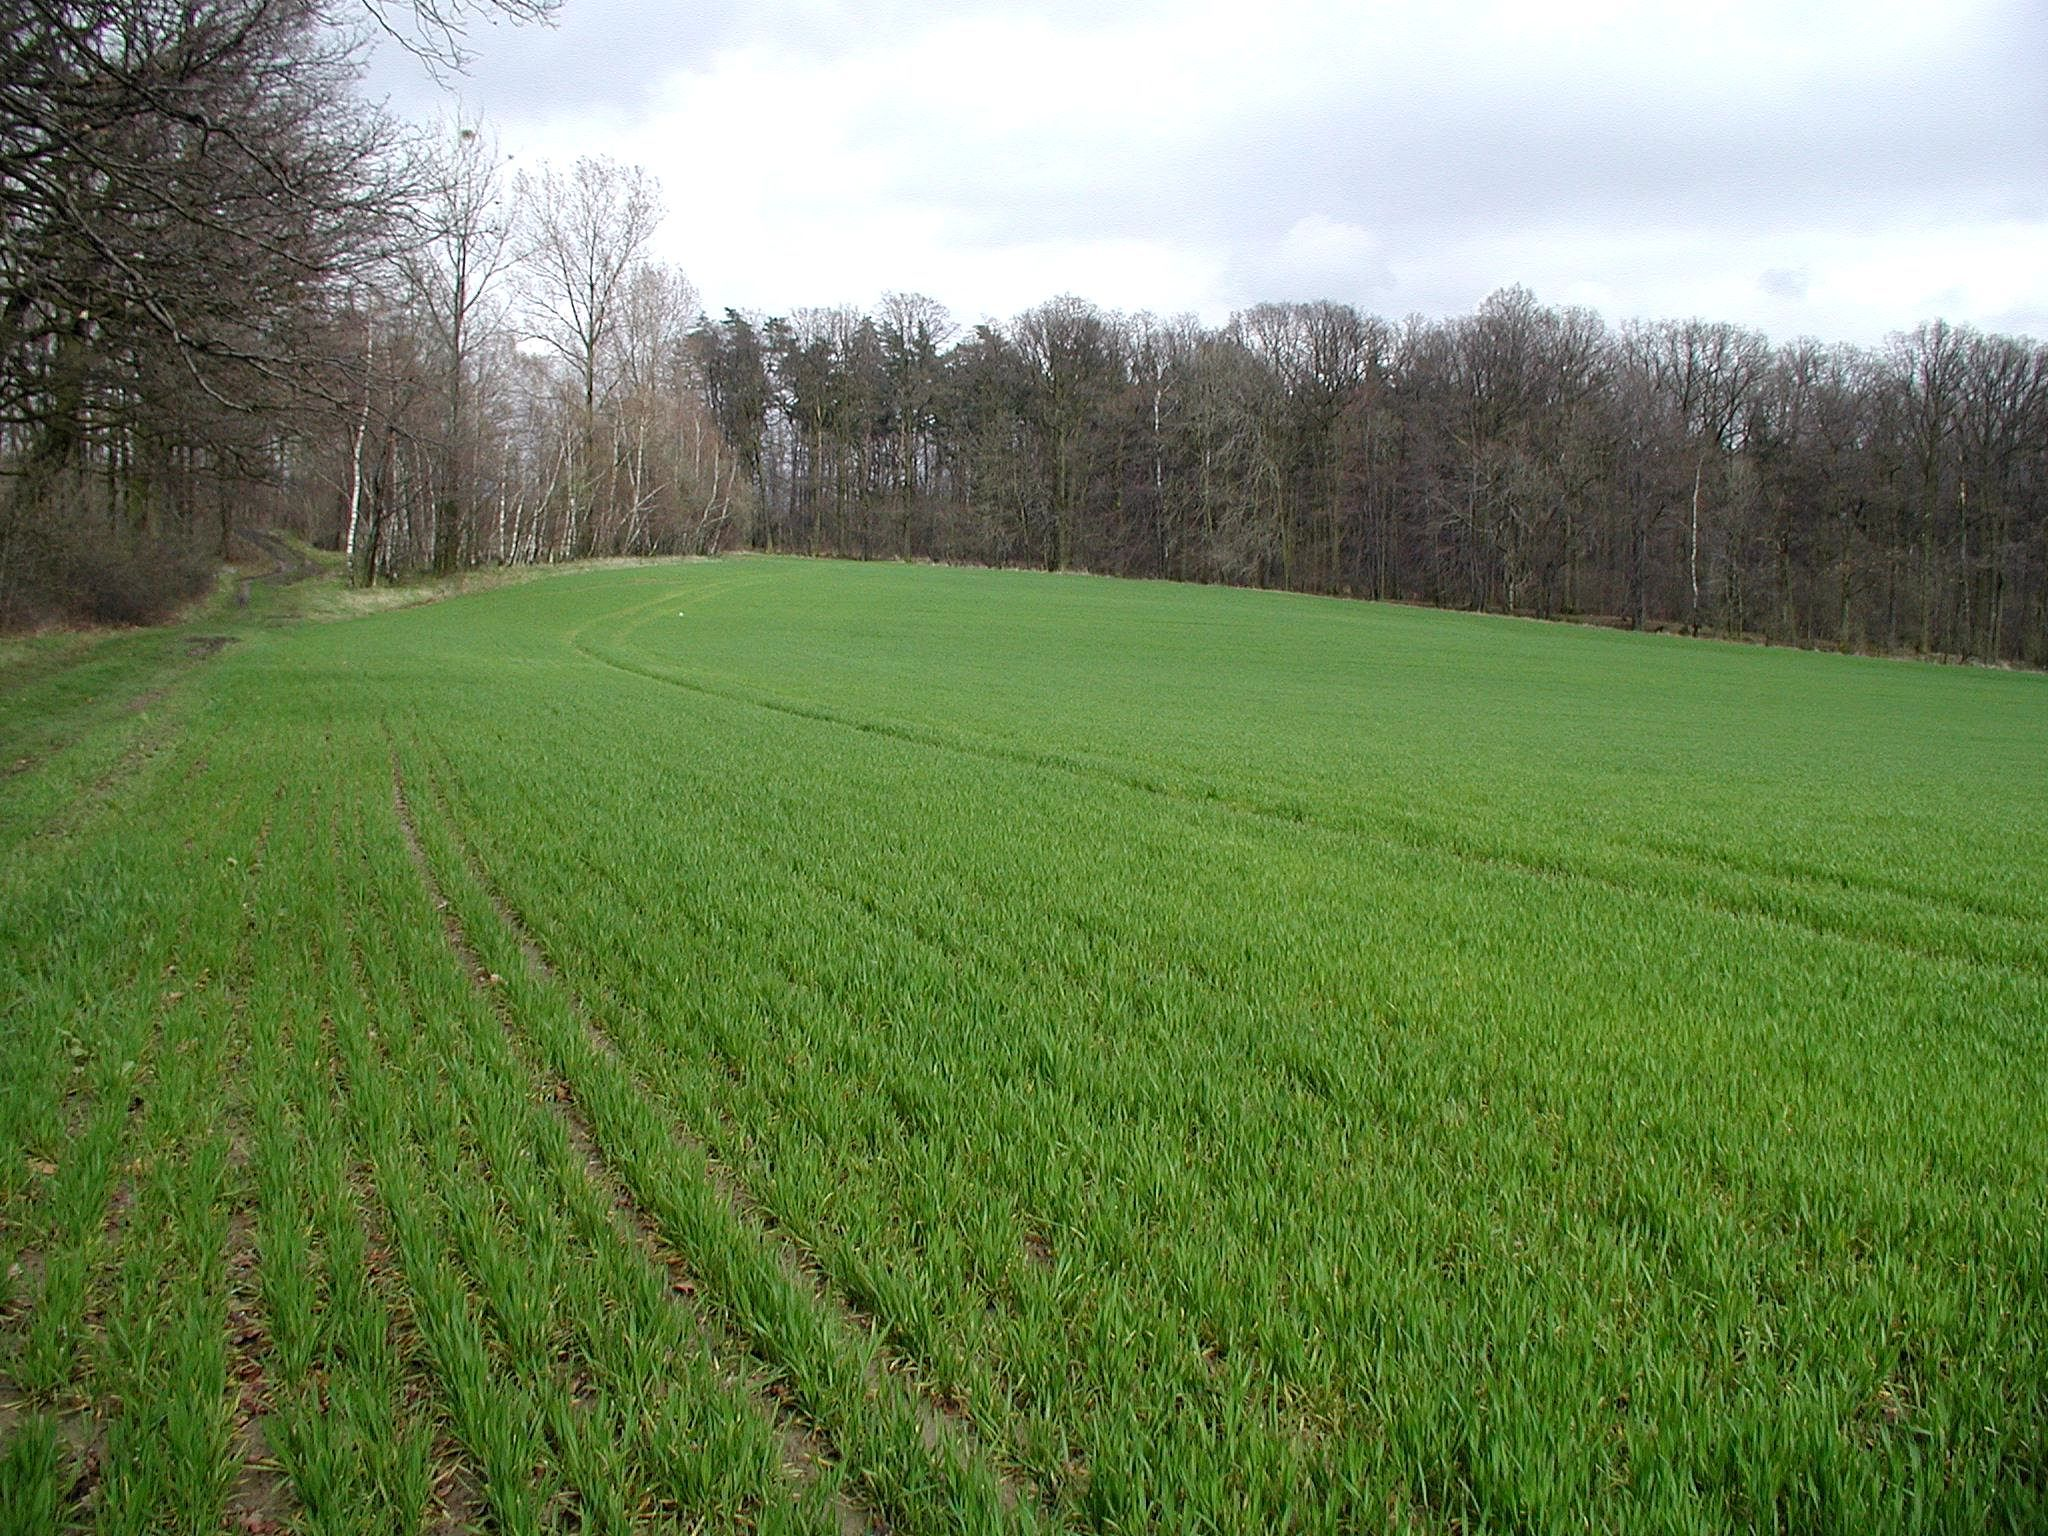 File:Field Green Pasture.jpg